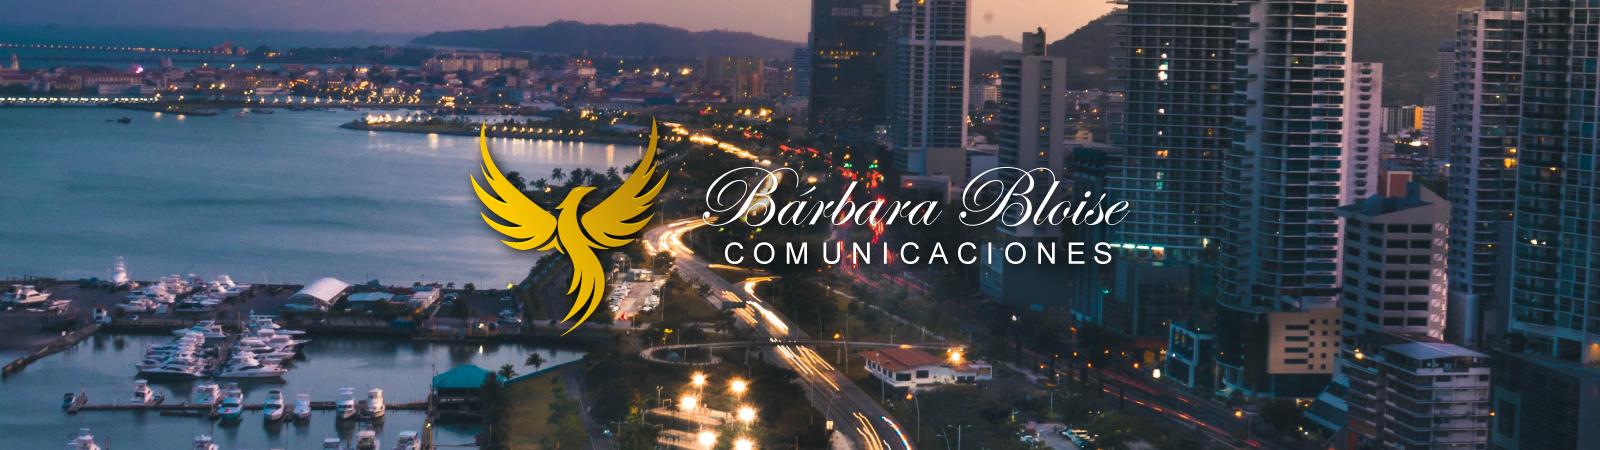 Bárbara Bloise Comunicaciones